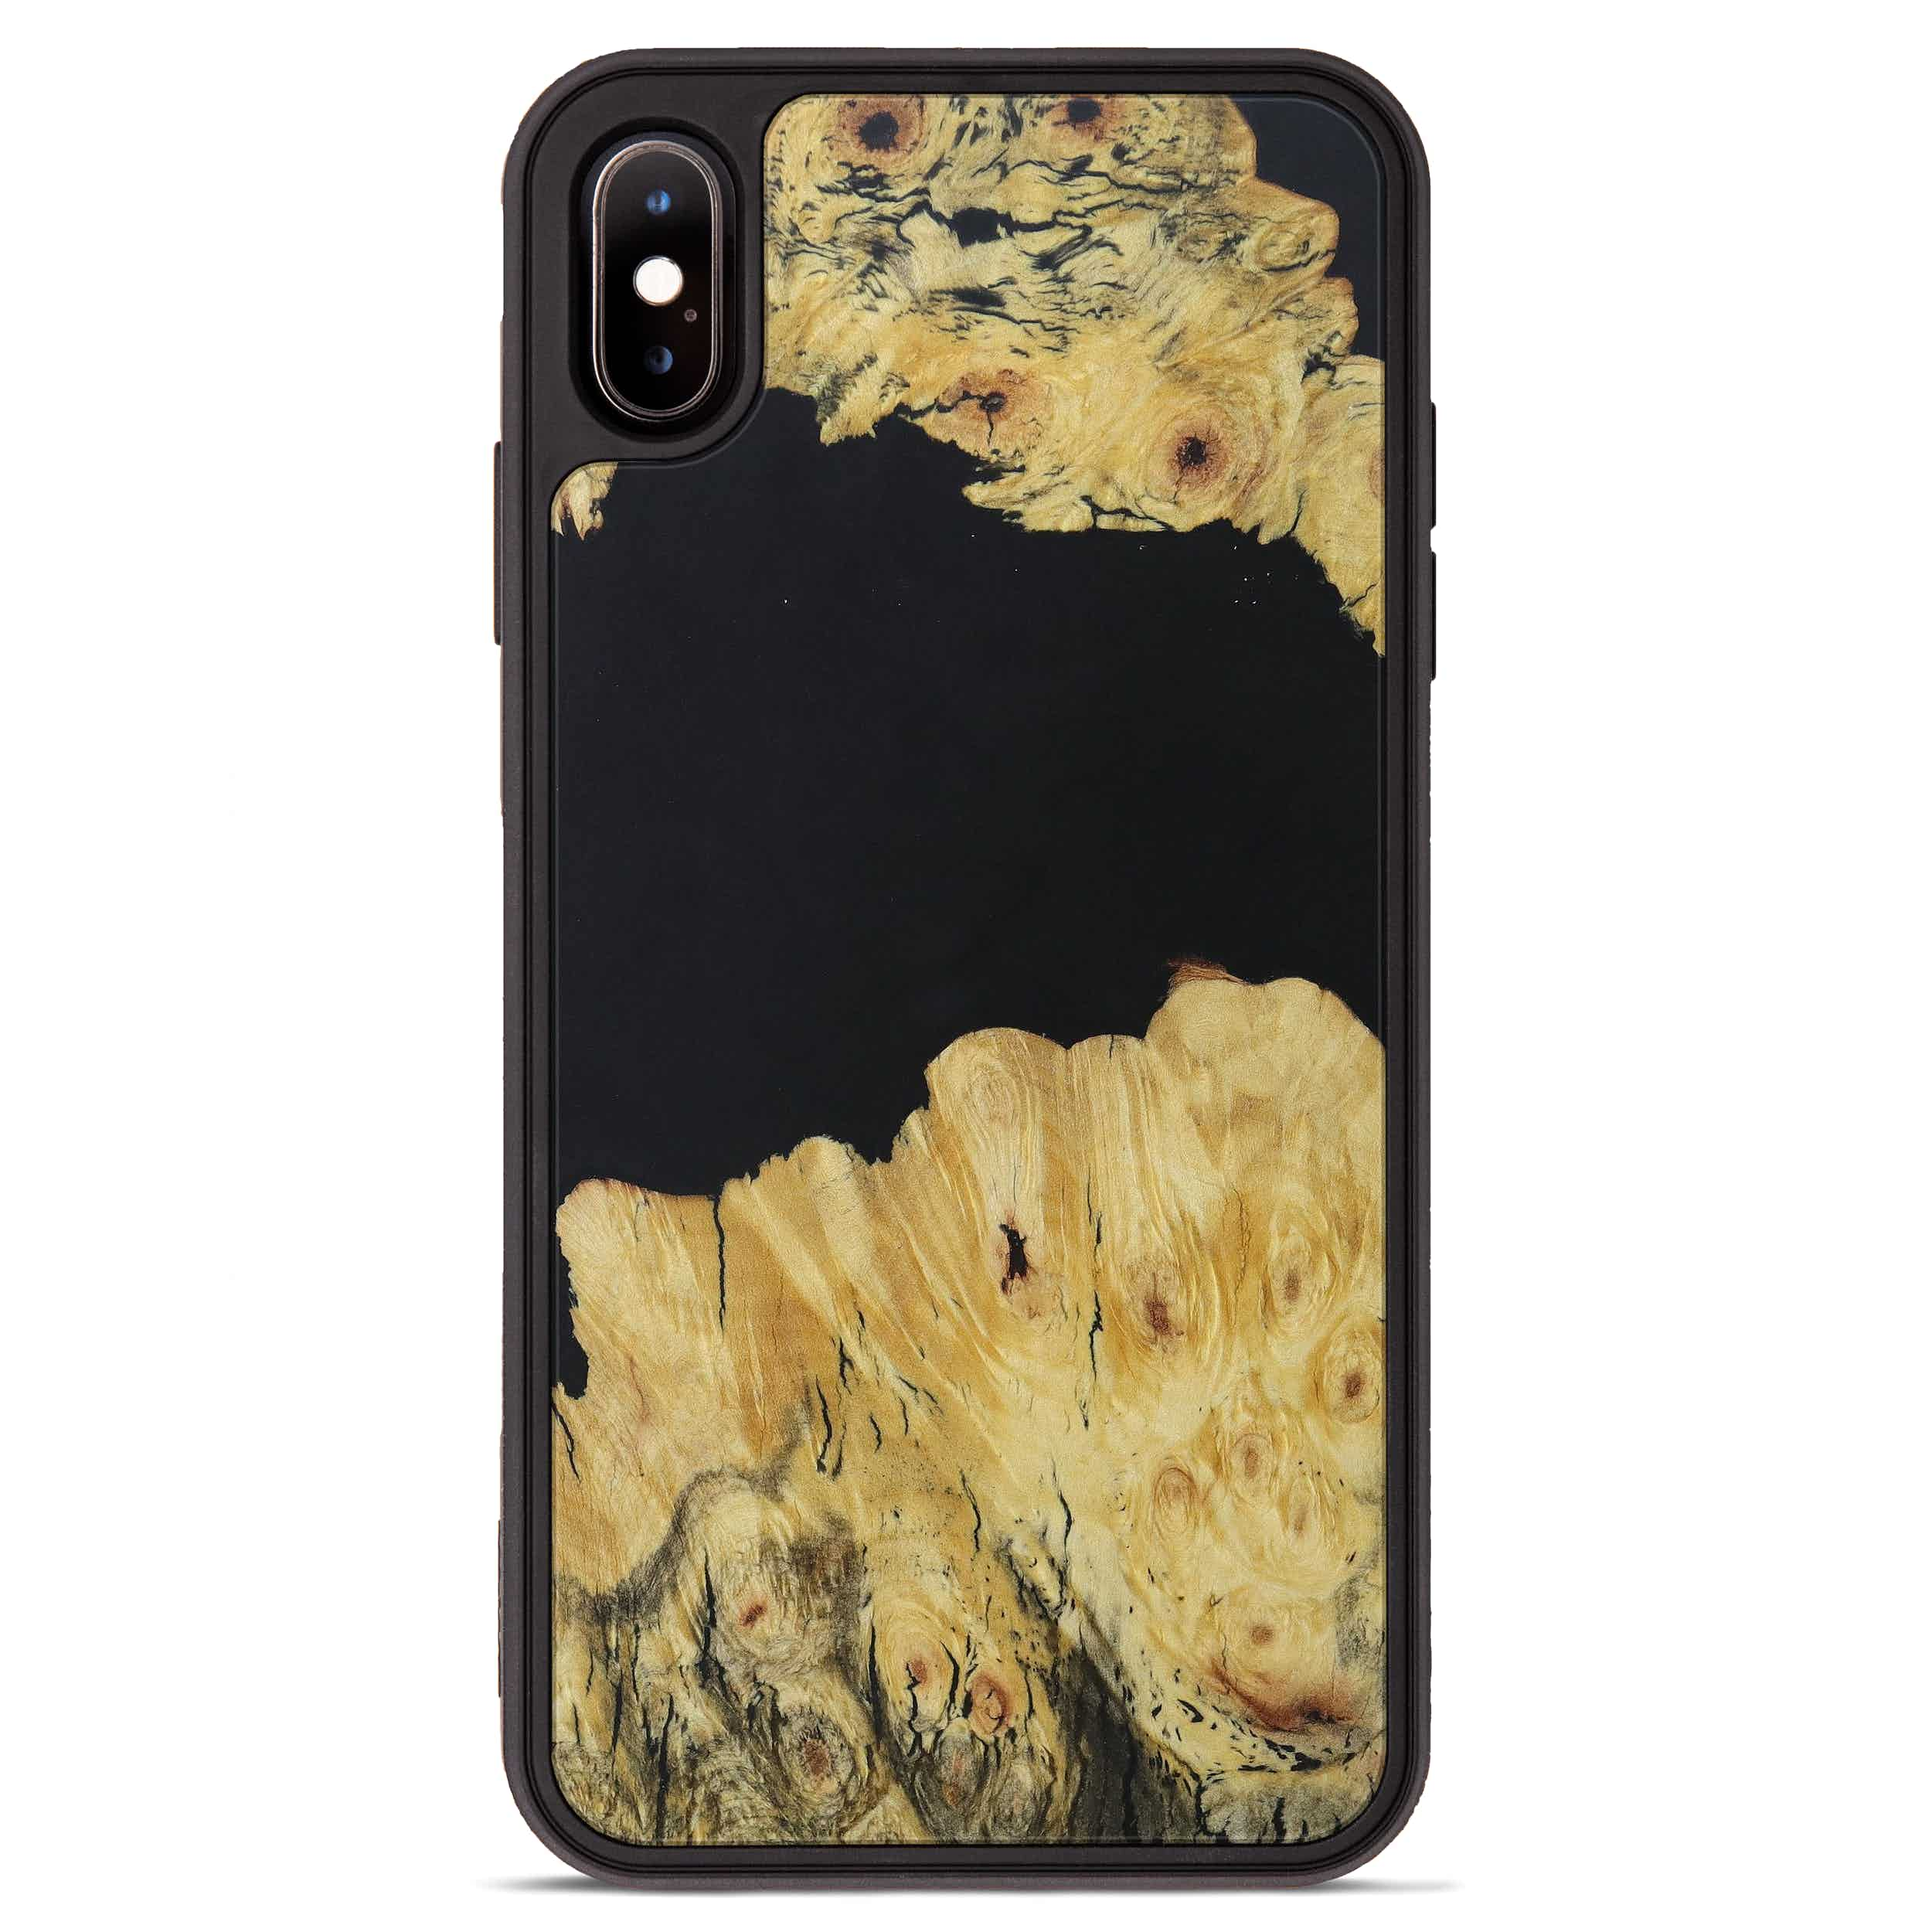 iPhone Xs Max Wood+Resin Phone Case - Darelle (Pure Black, 395155)